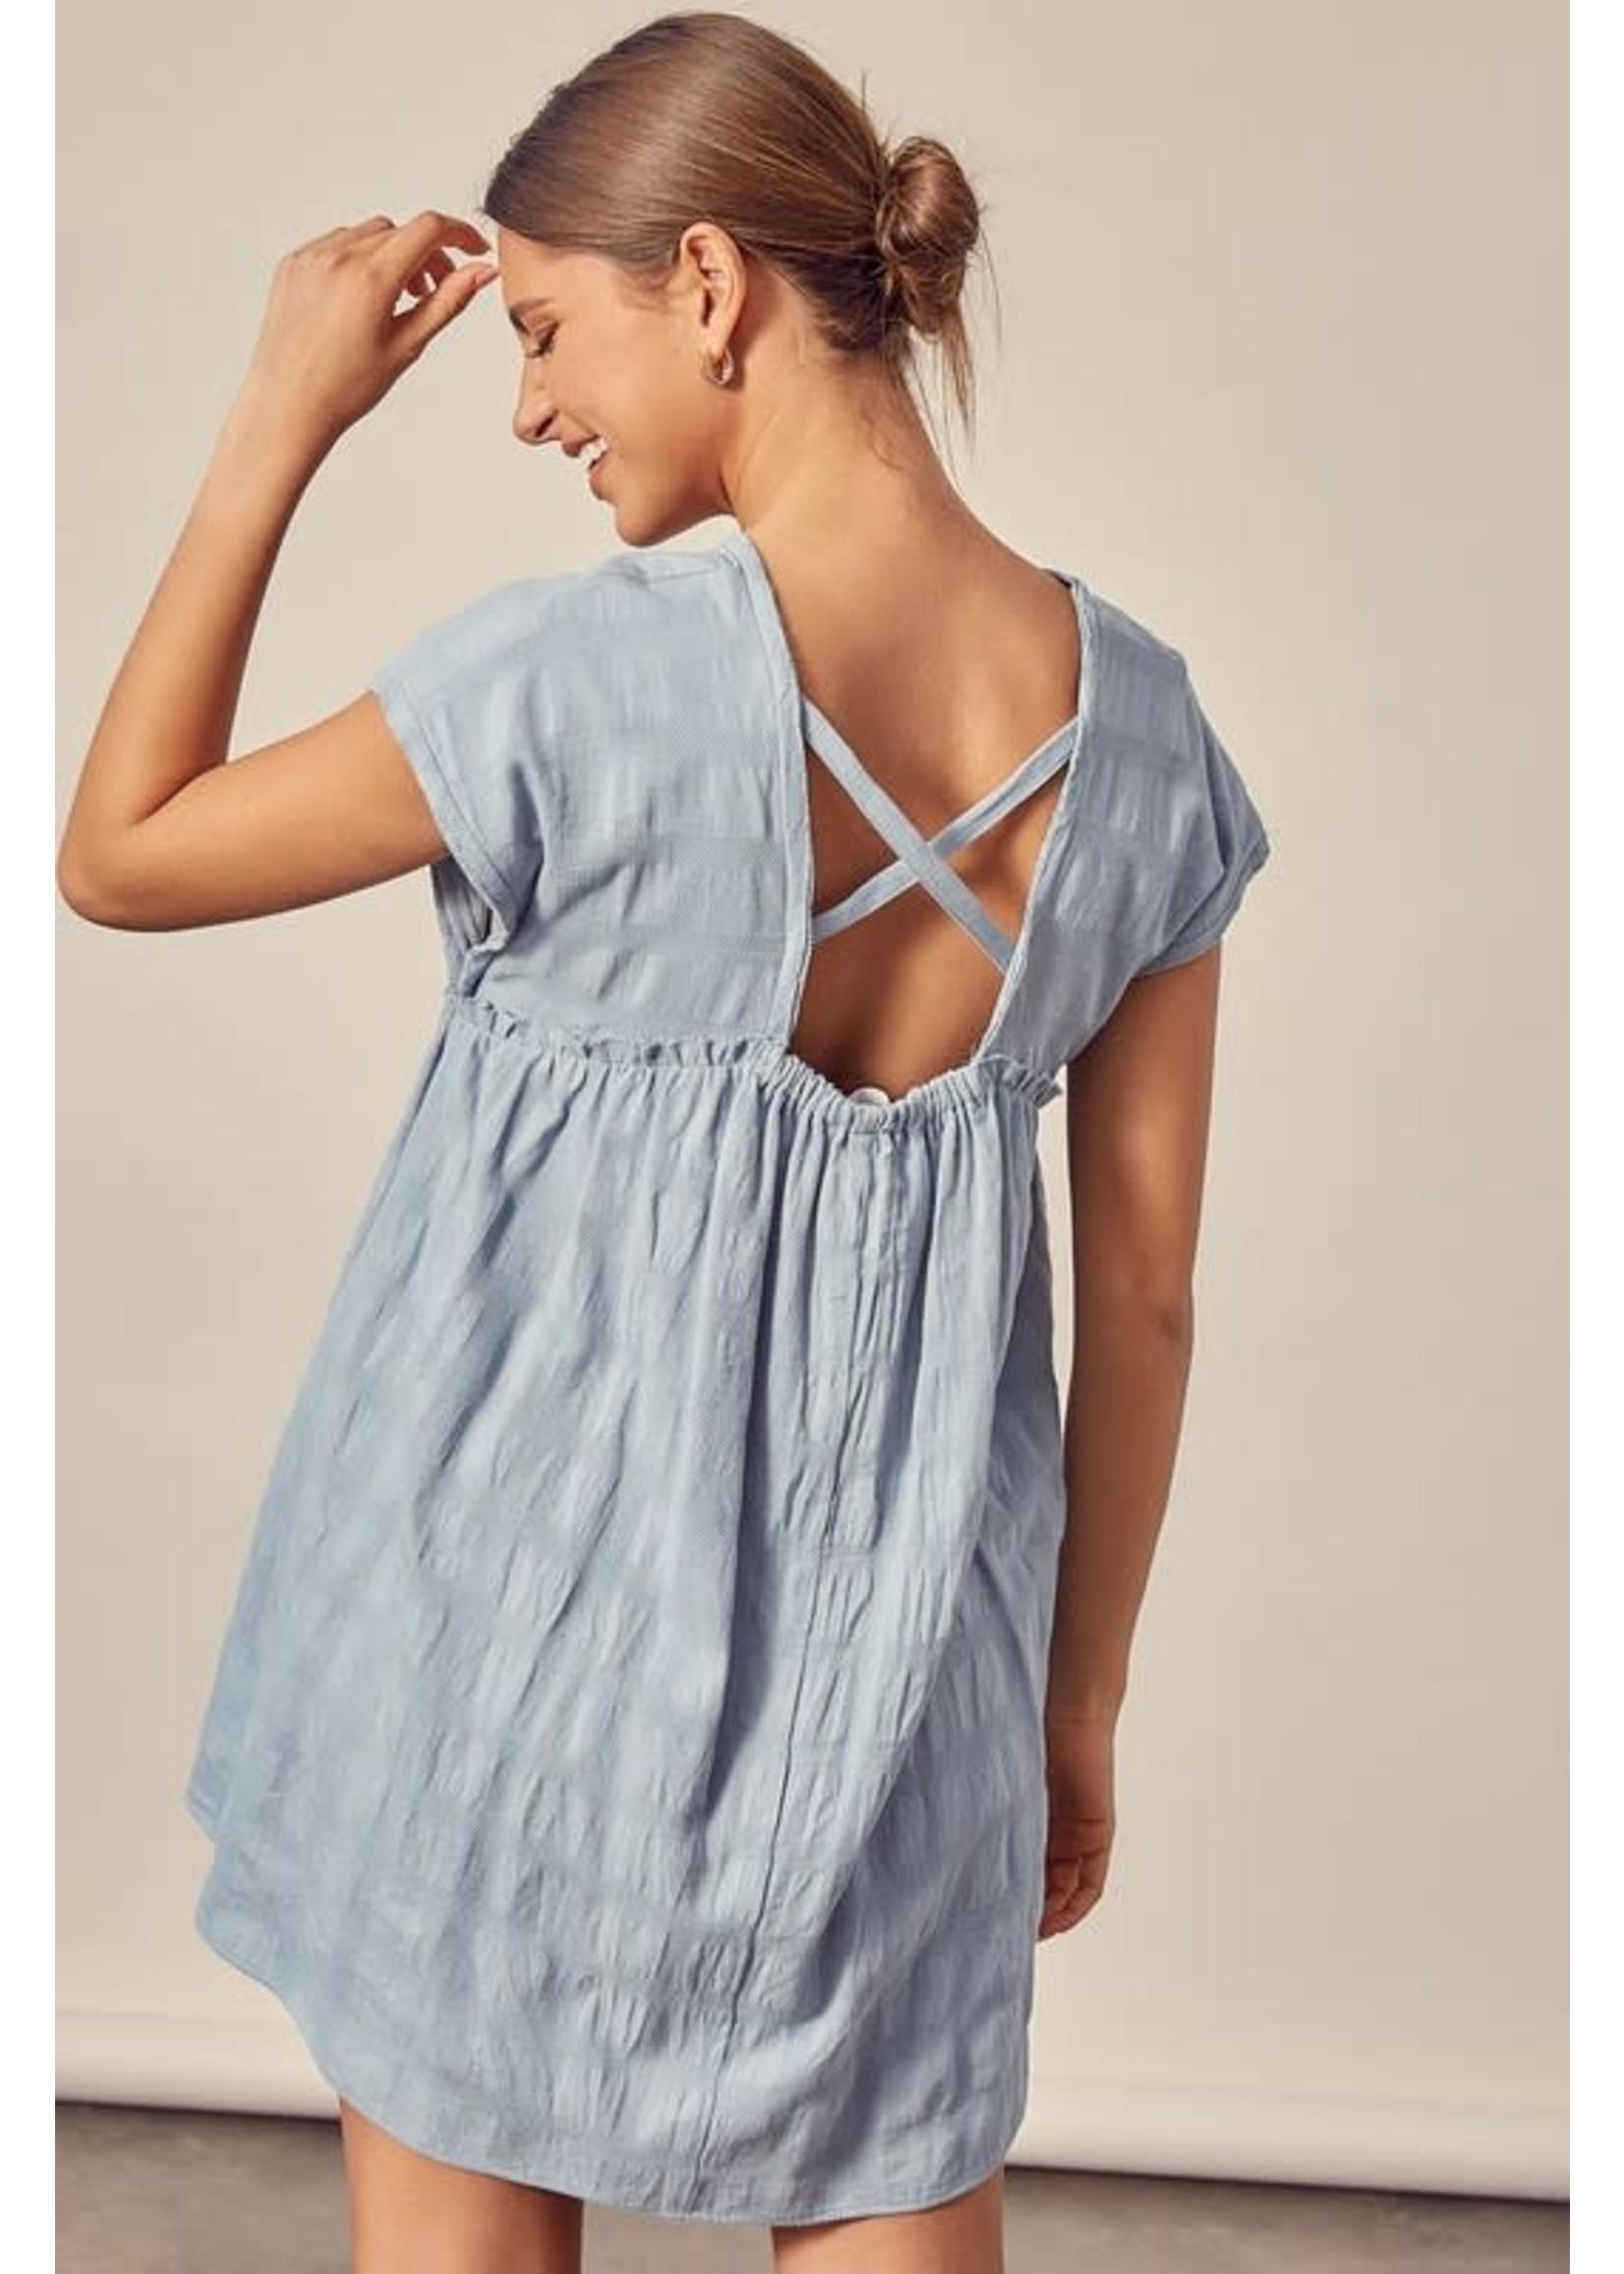 Mustard Seed Button Down Textured Dress - S17876